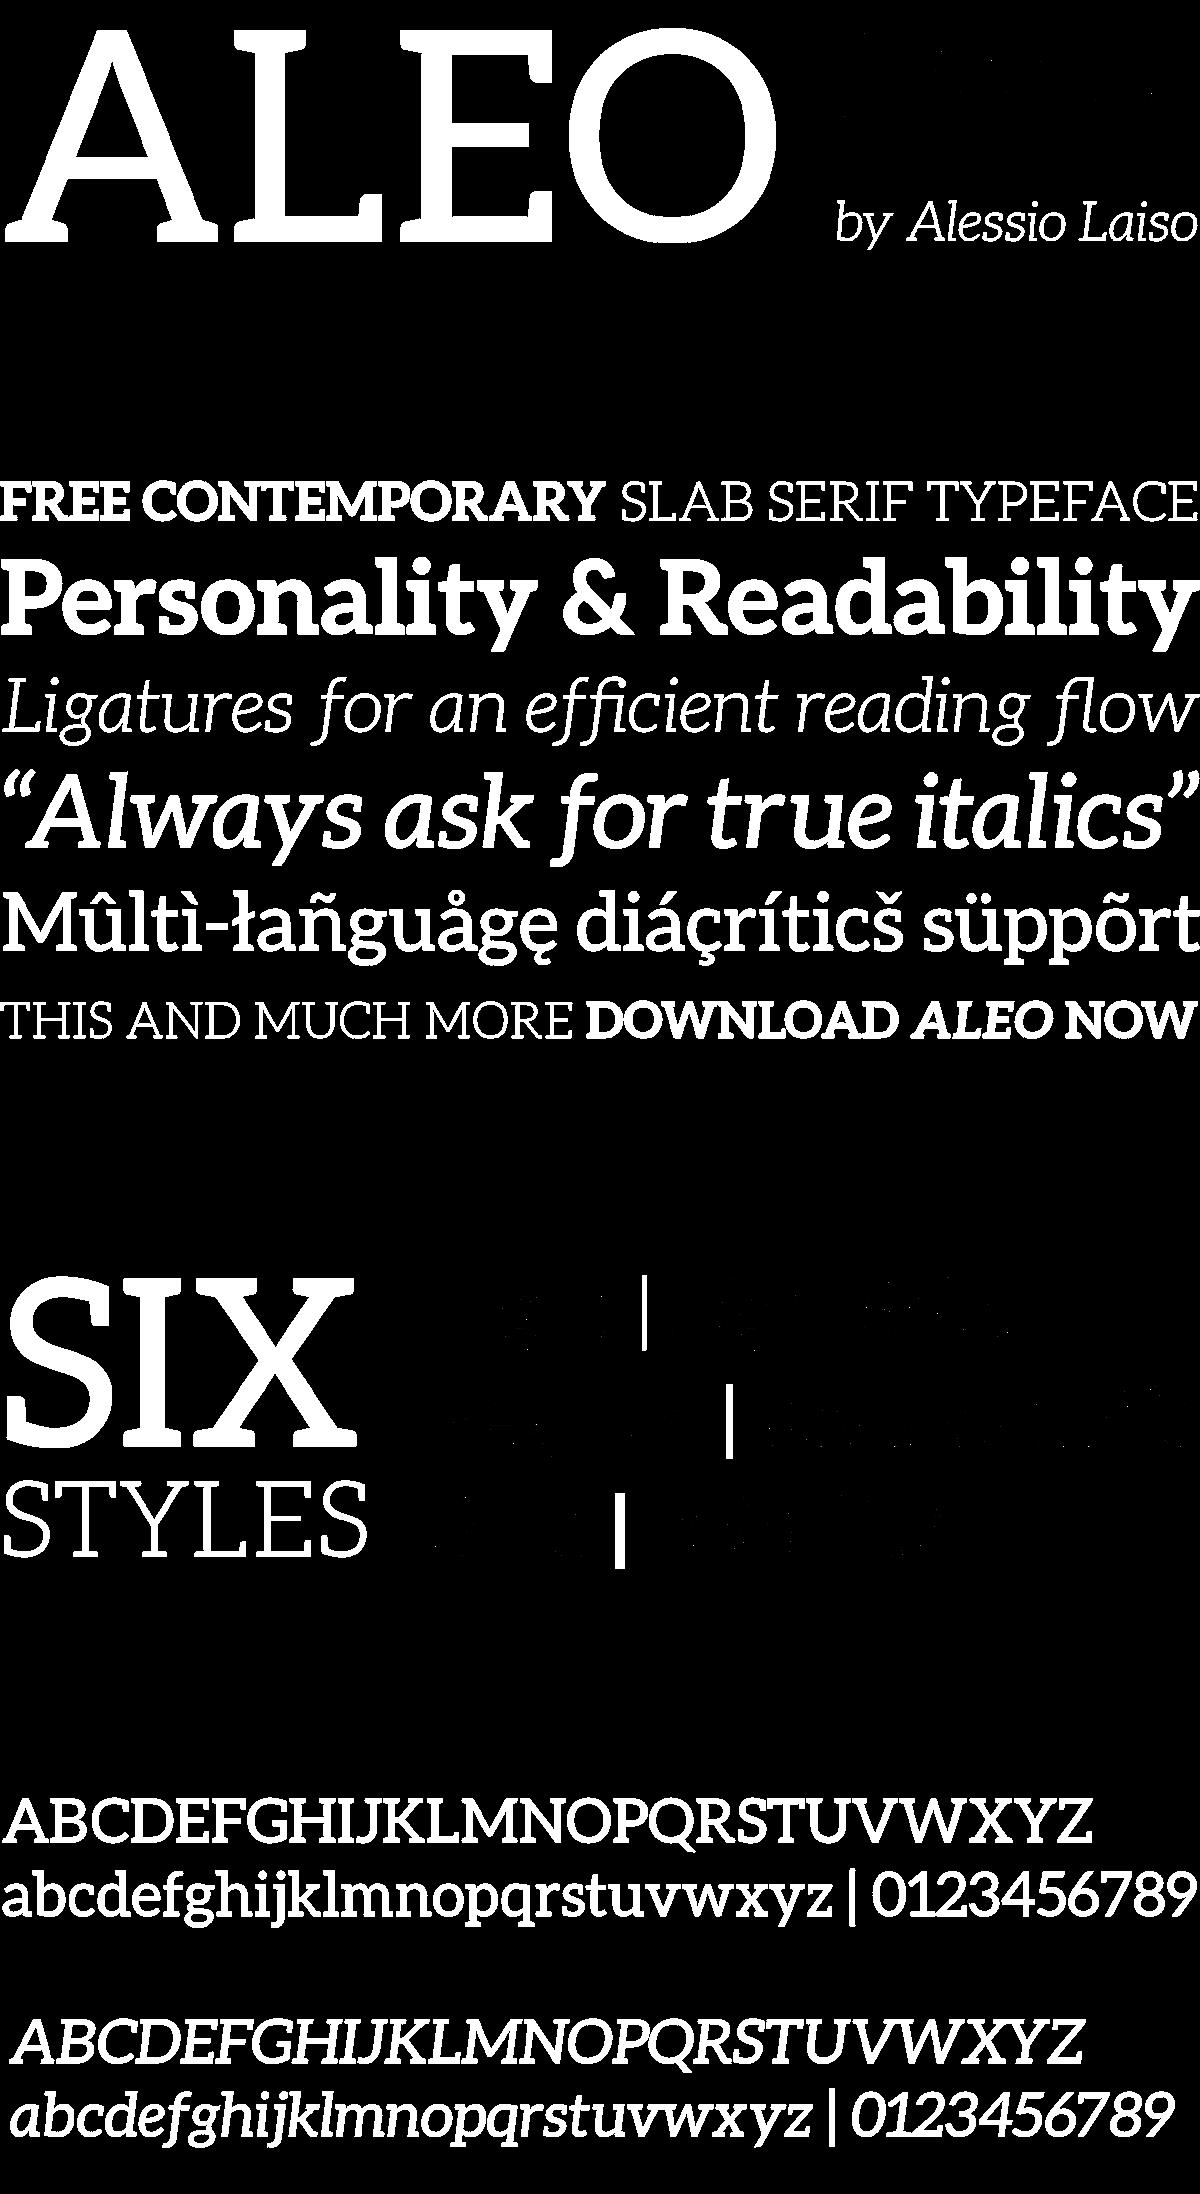 Aleo Free Font Family On Behance Free Font Fonts Graphic Design Fonts